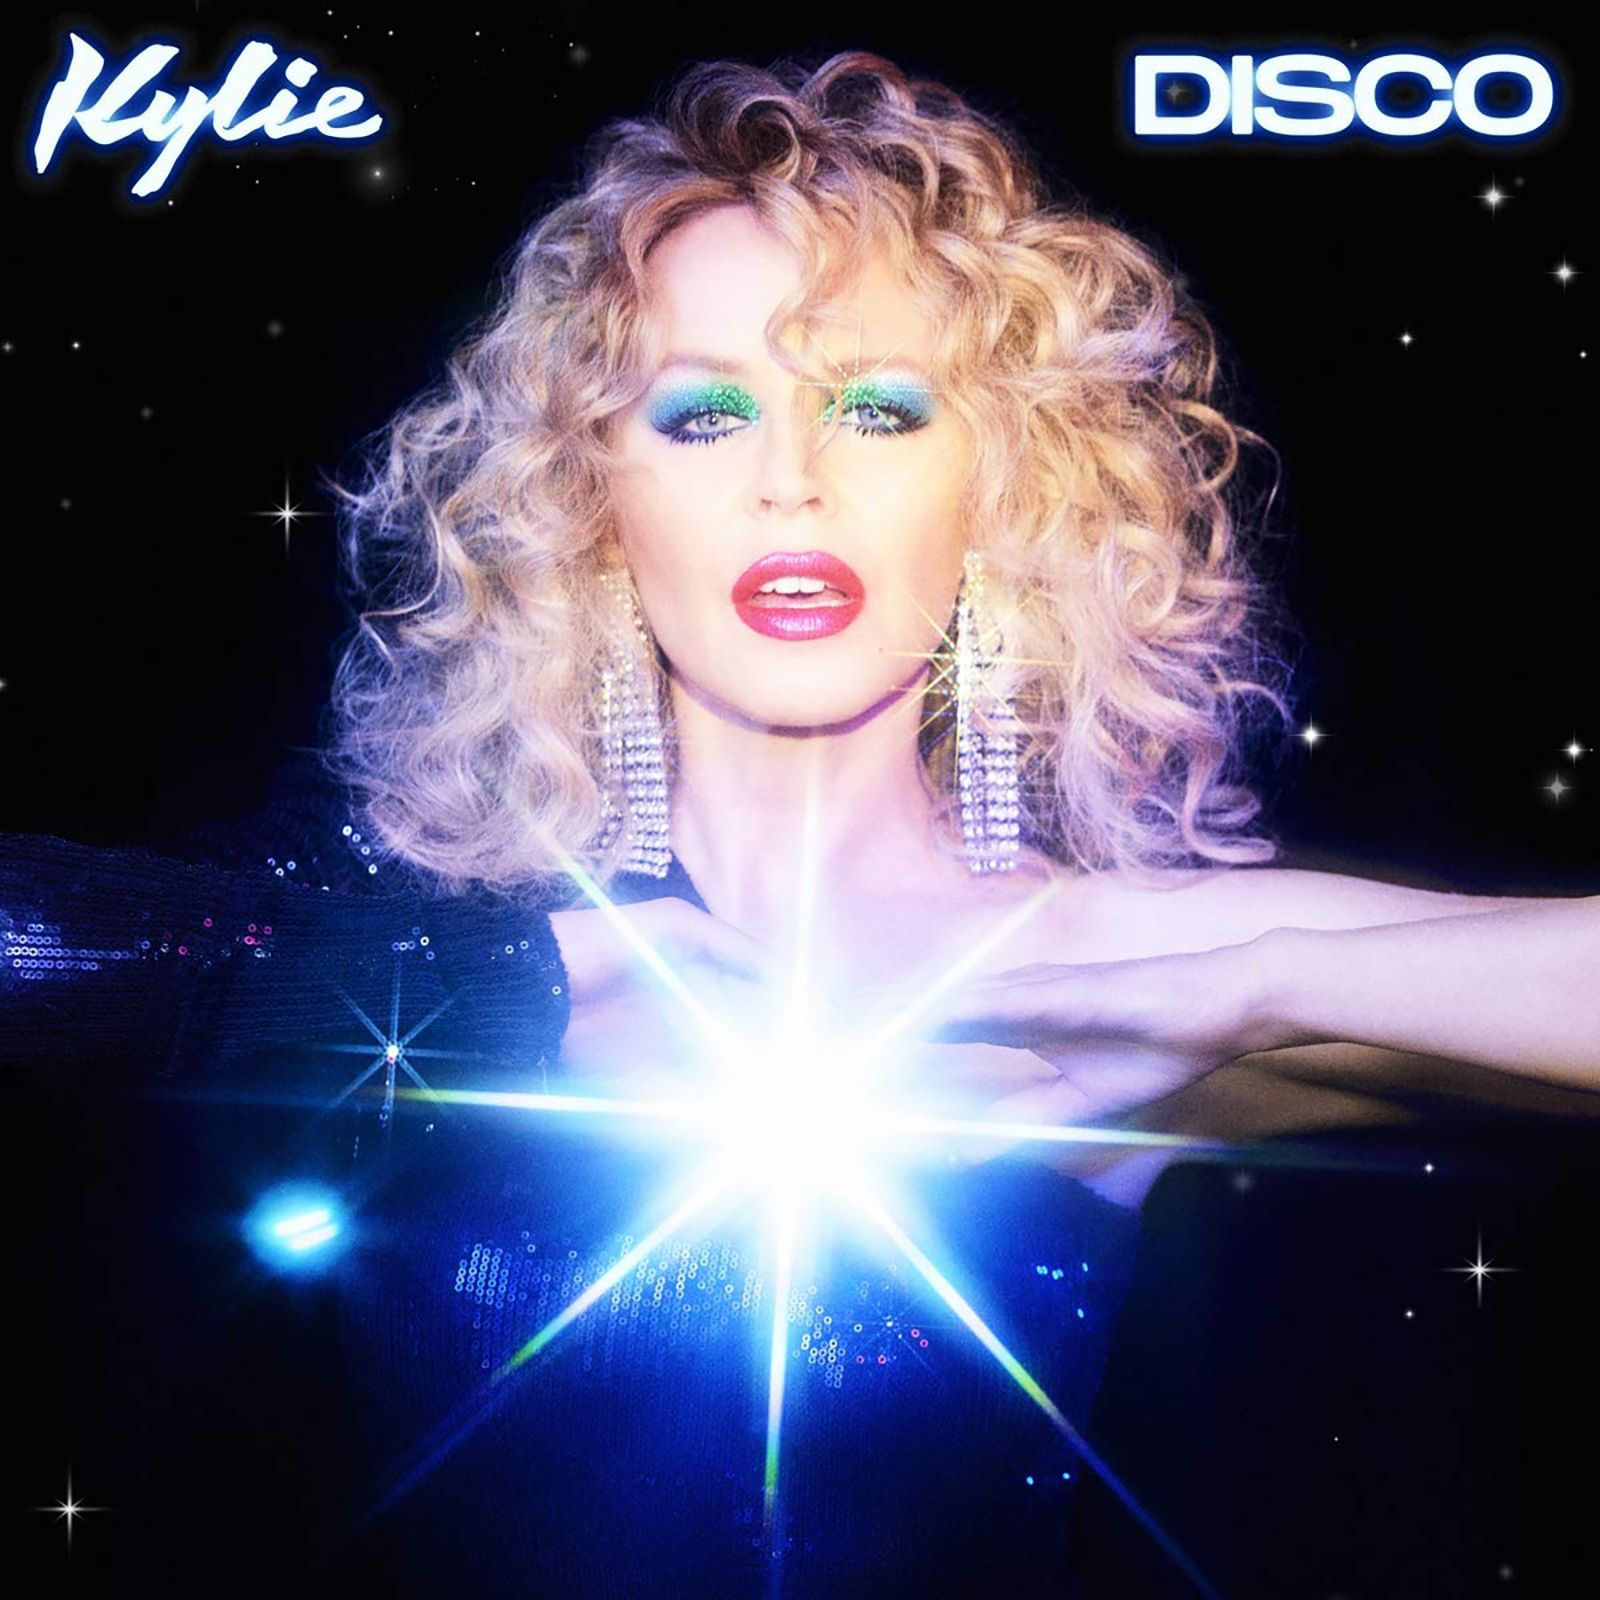 Abgehört/ Kylie Minogue: Disco COVER